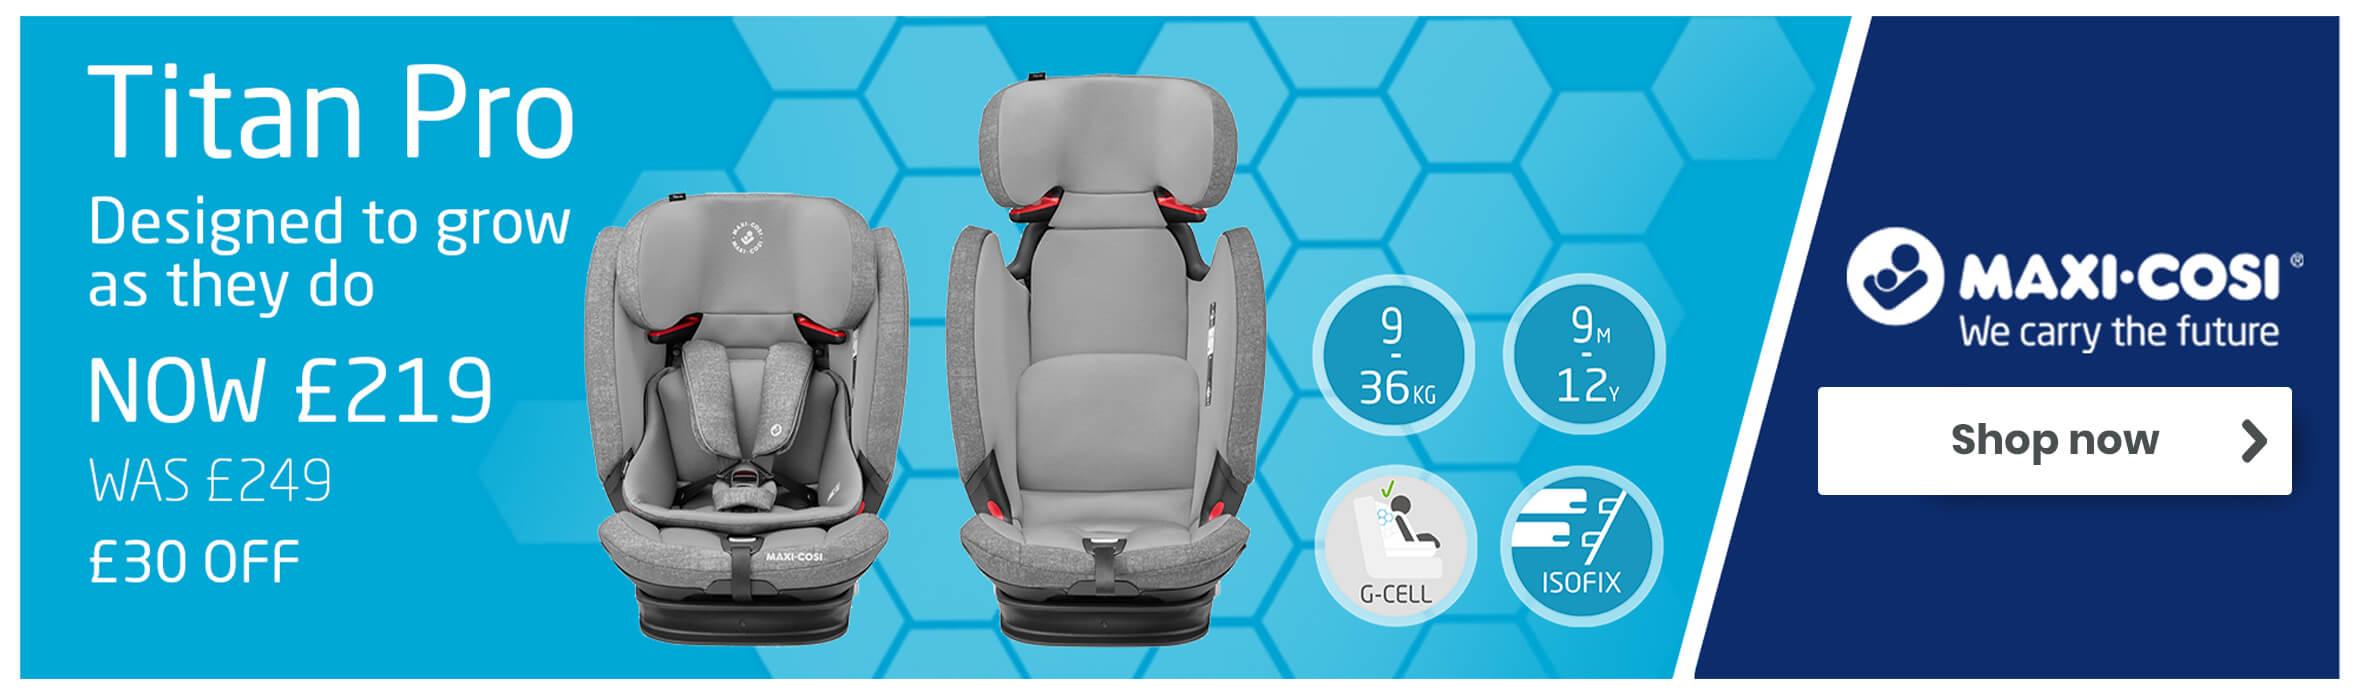 Maxi-Cosi Titan Pro - Designed to Grow as They Do - Now £219